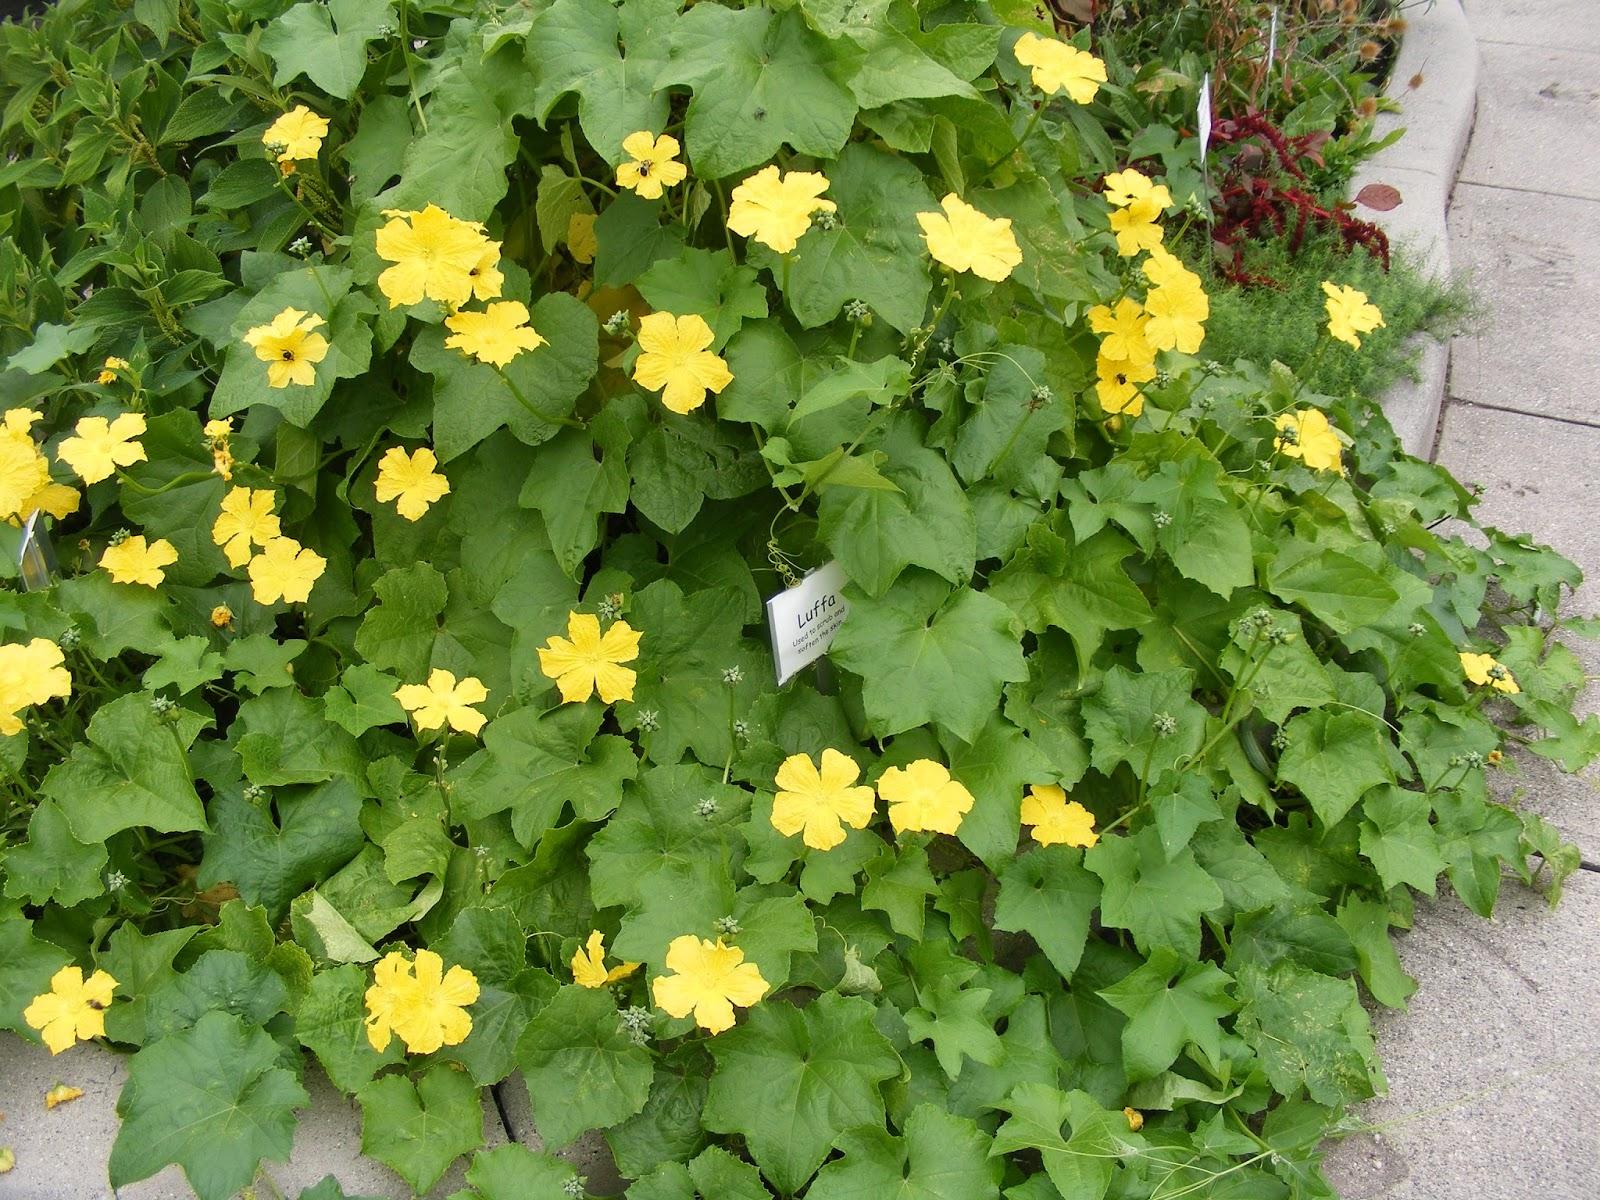 Flower Garden Eaton Rapids Michigan: Eaton Rapids Joe: Gardens